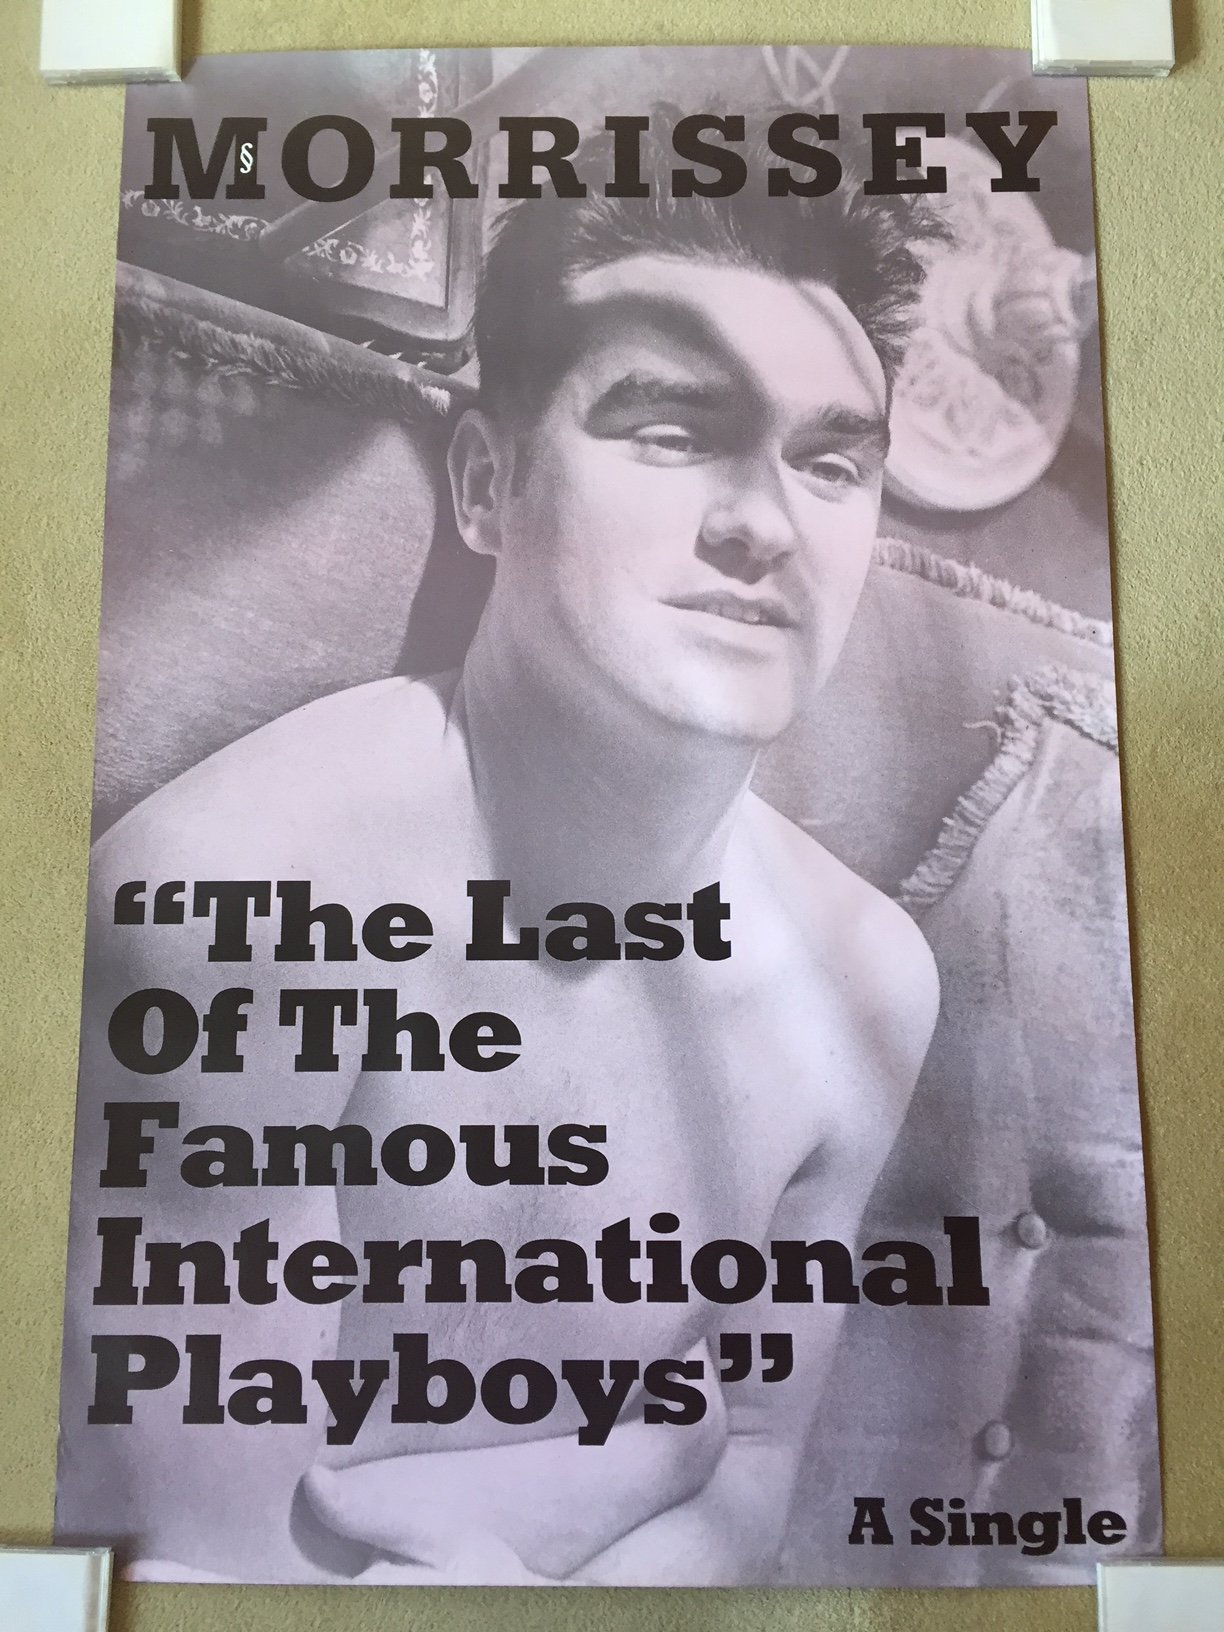 Morrissey Playboys promo poster.jpg